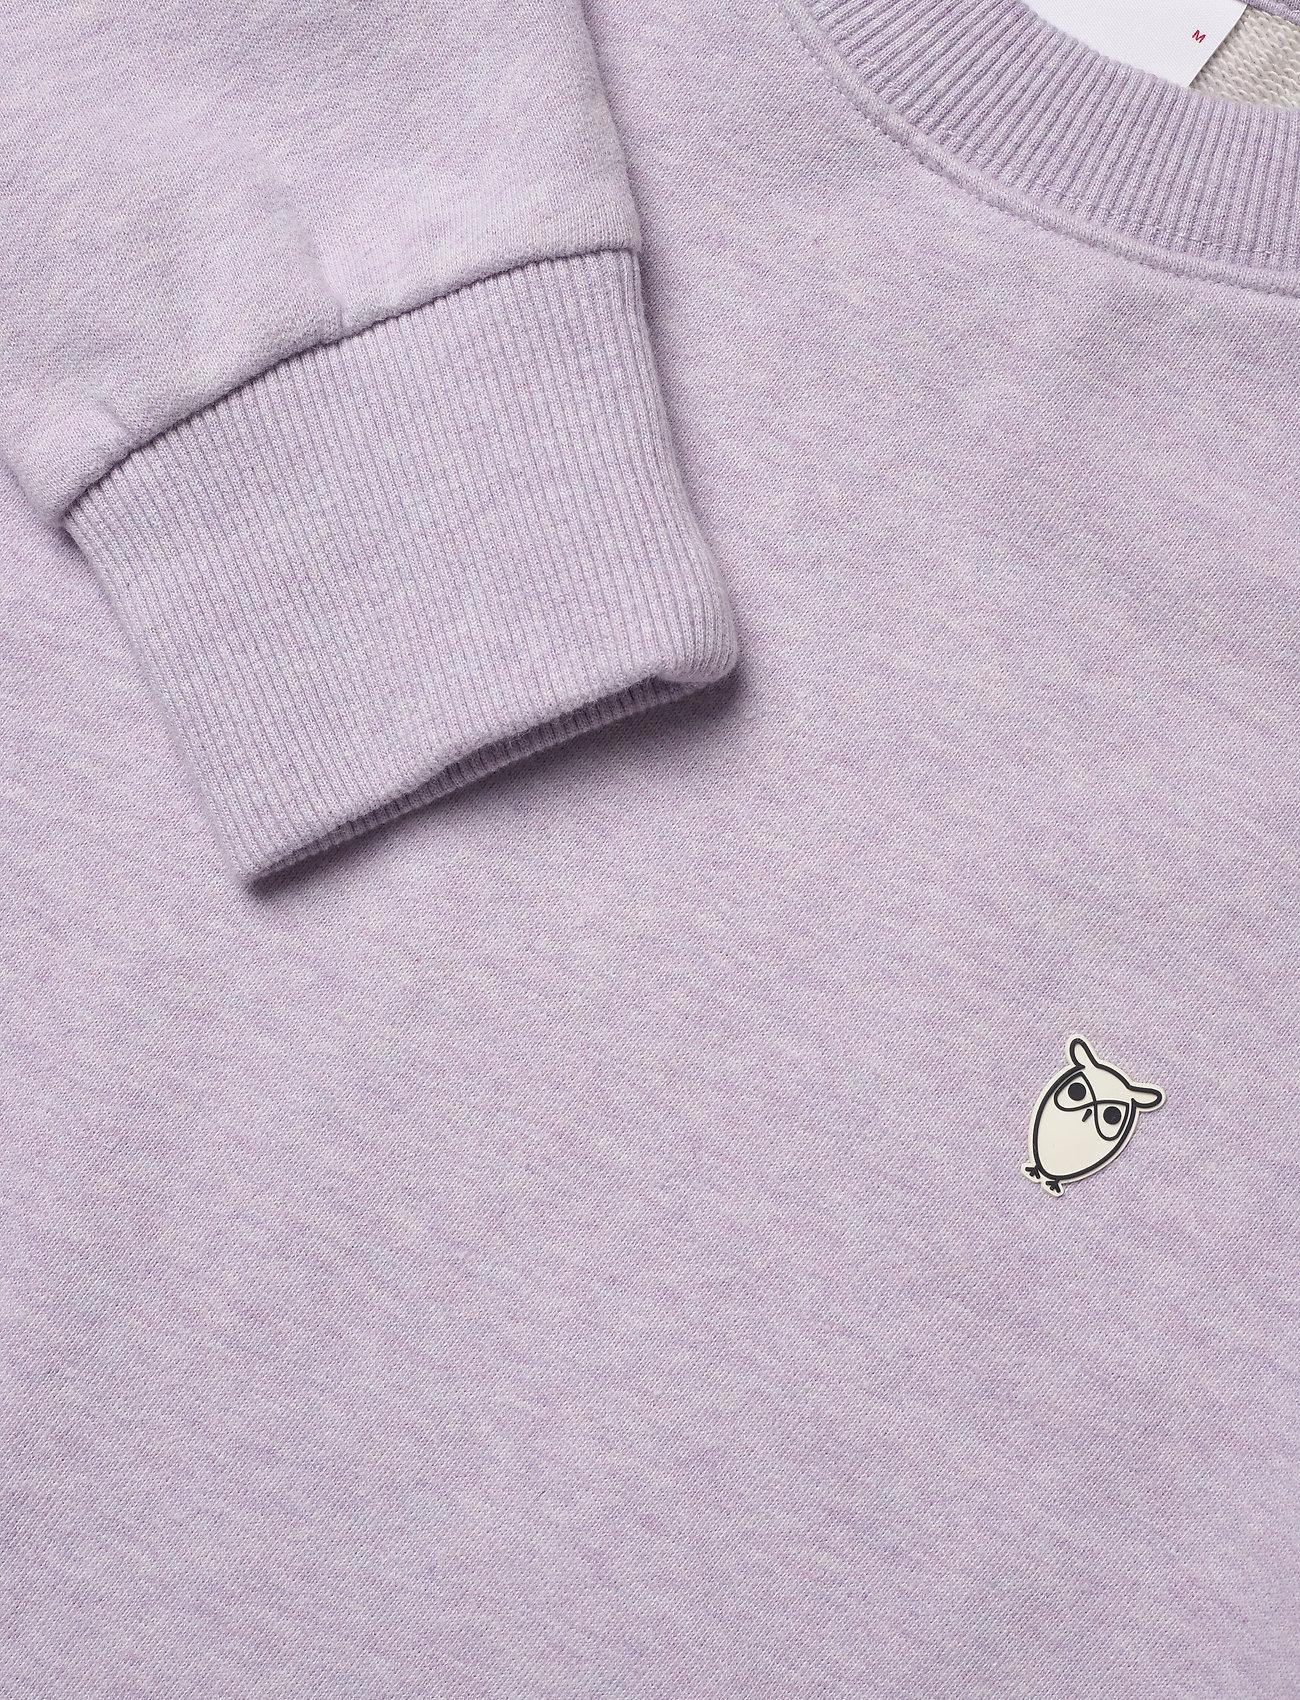 Elm Small Owl Sweat - Gots/vegan (Lavender Melange) (51.97 €) - Knowledge Cotton Apparel vk8UvRss